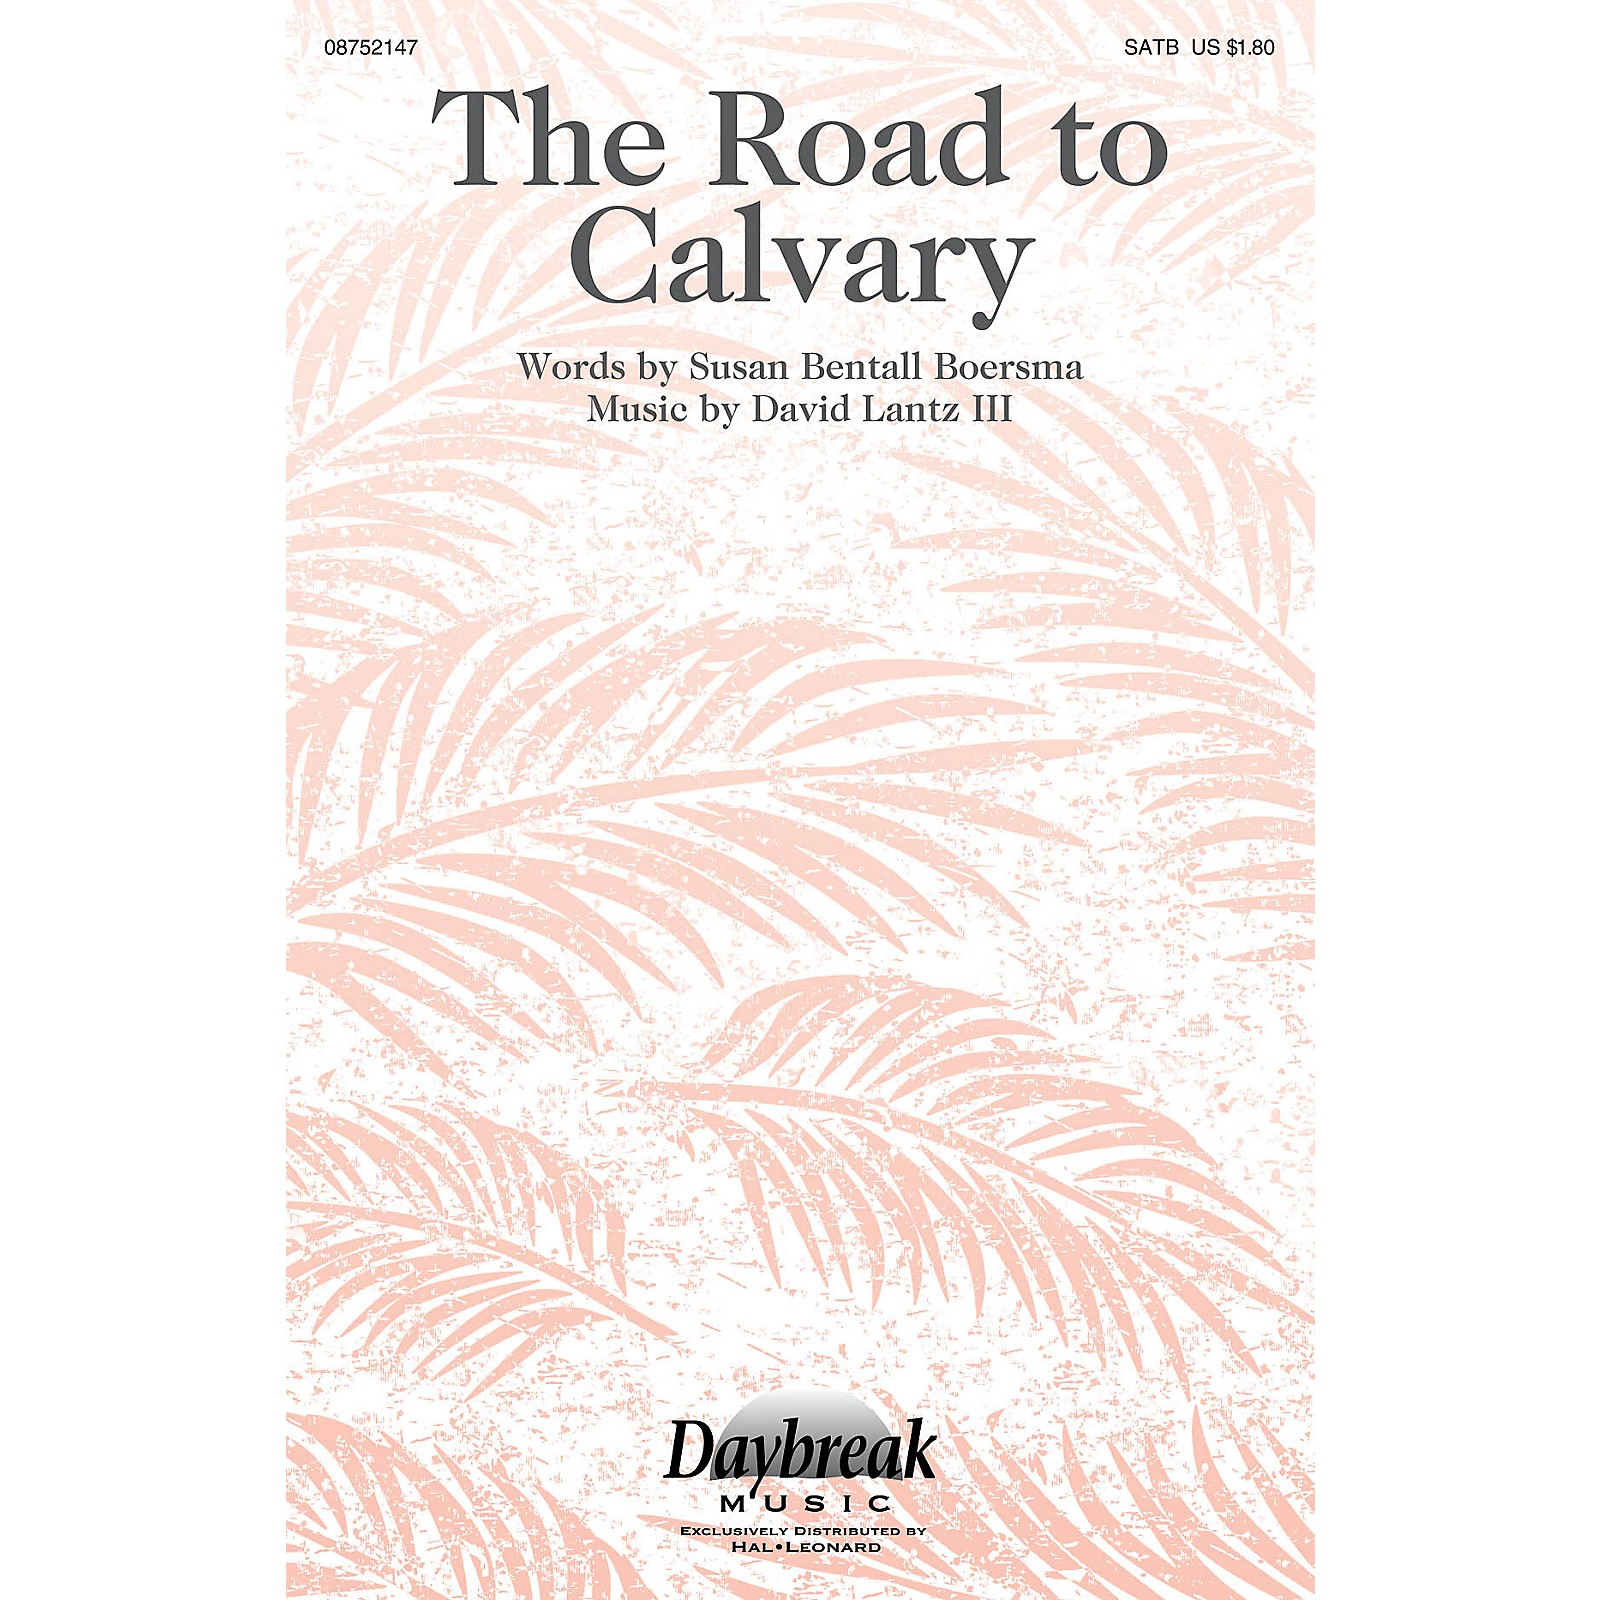 Daybreak Music The Road to Calvary SATB composed by David Lantz III